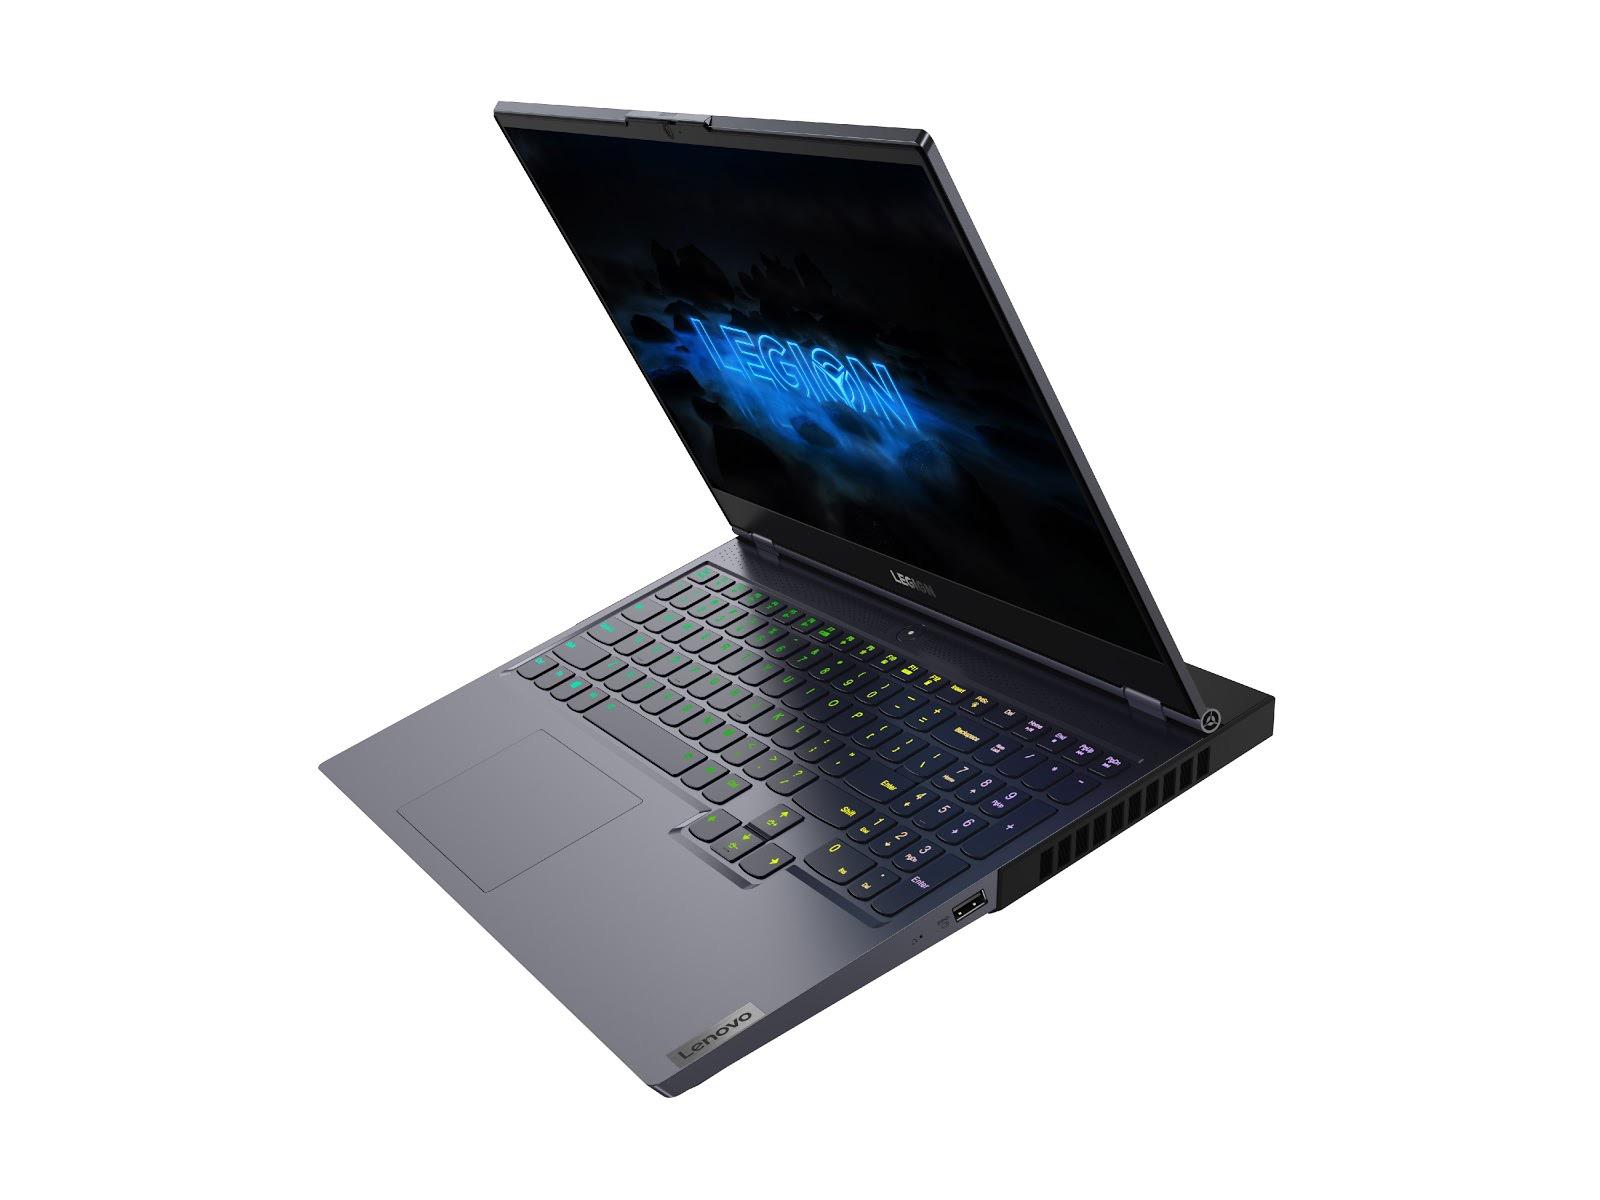 Фото 2. Ноутбук Lenovo Legion 7i 15IMHg05 Slate grey (81YU0077RK)